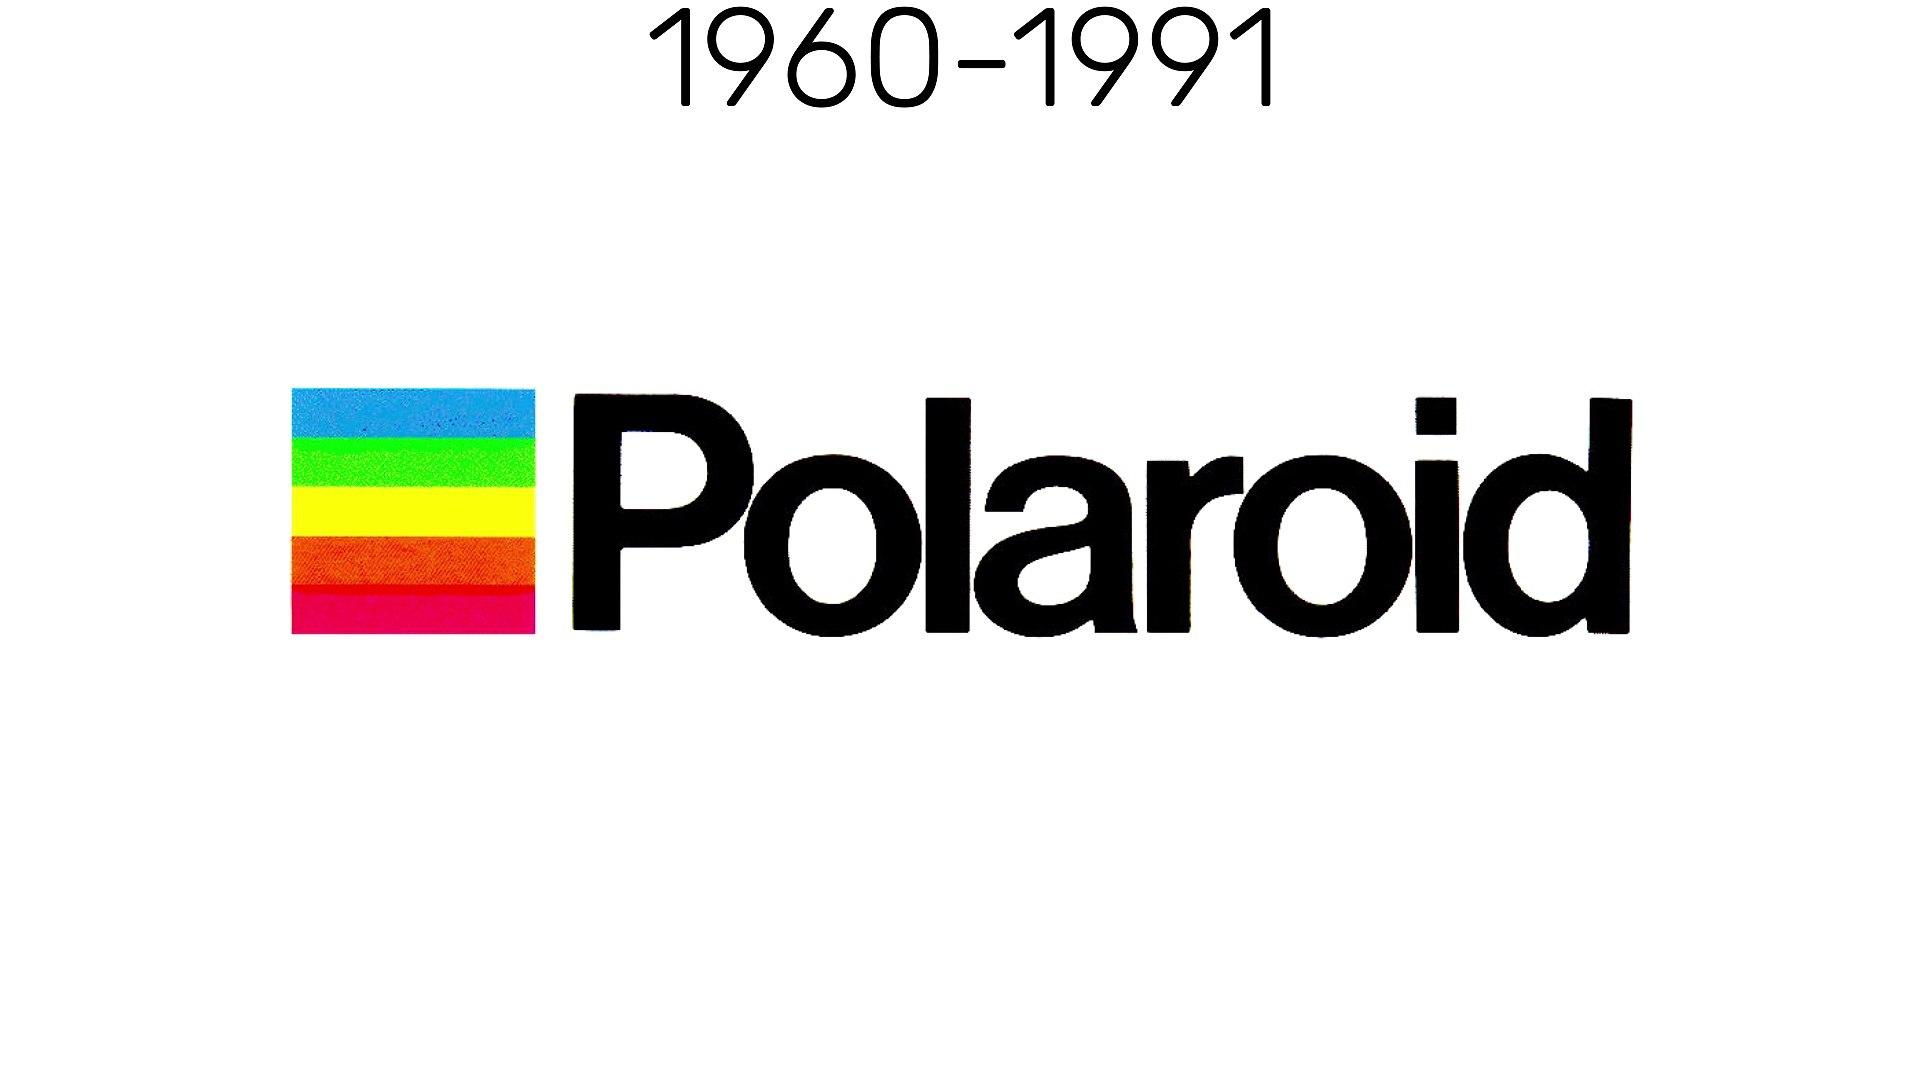 Polaroid Logo History  Business Trivia  - video dailymotion